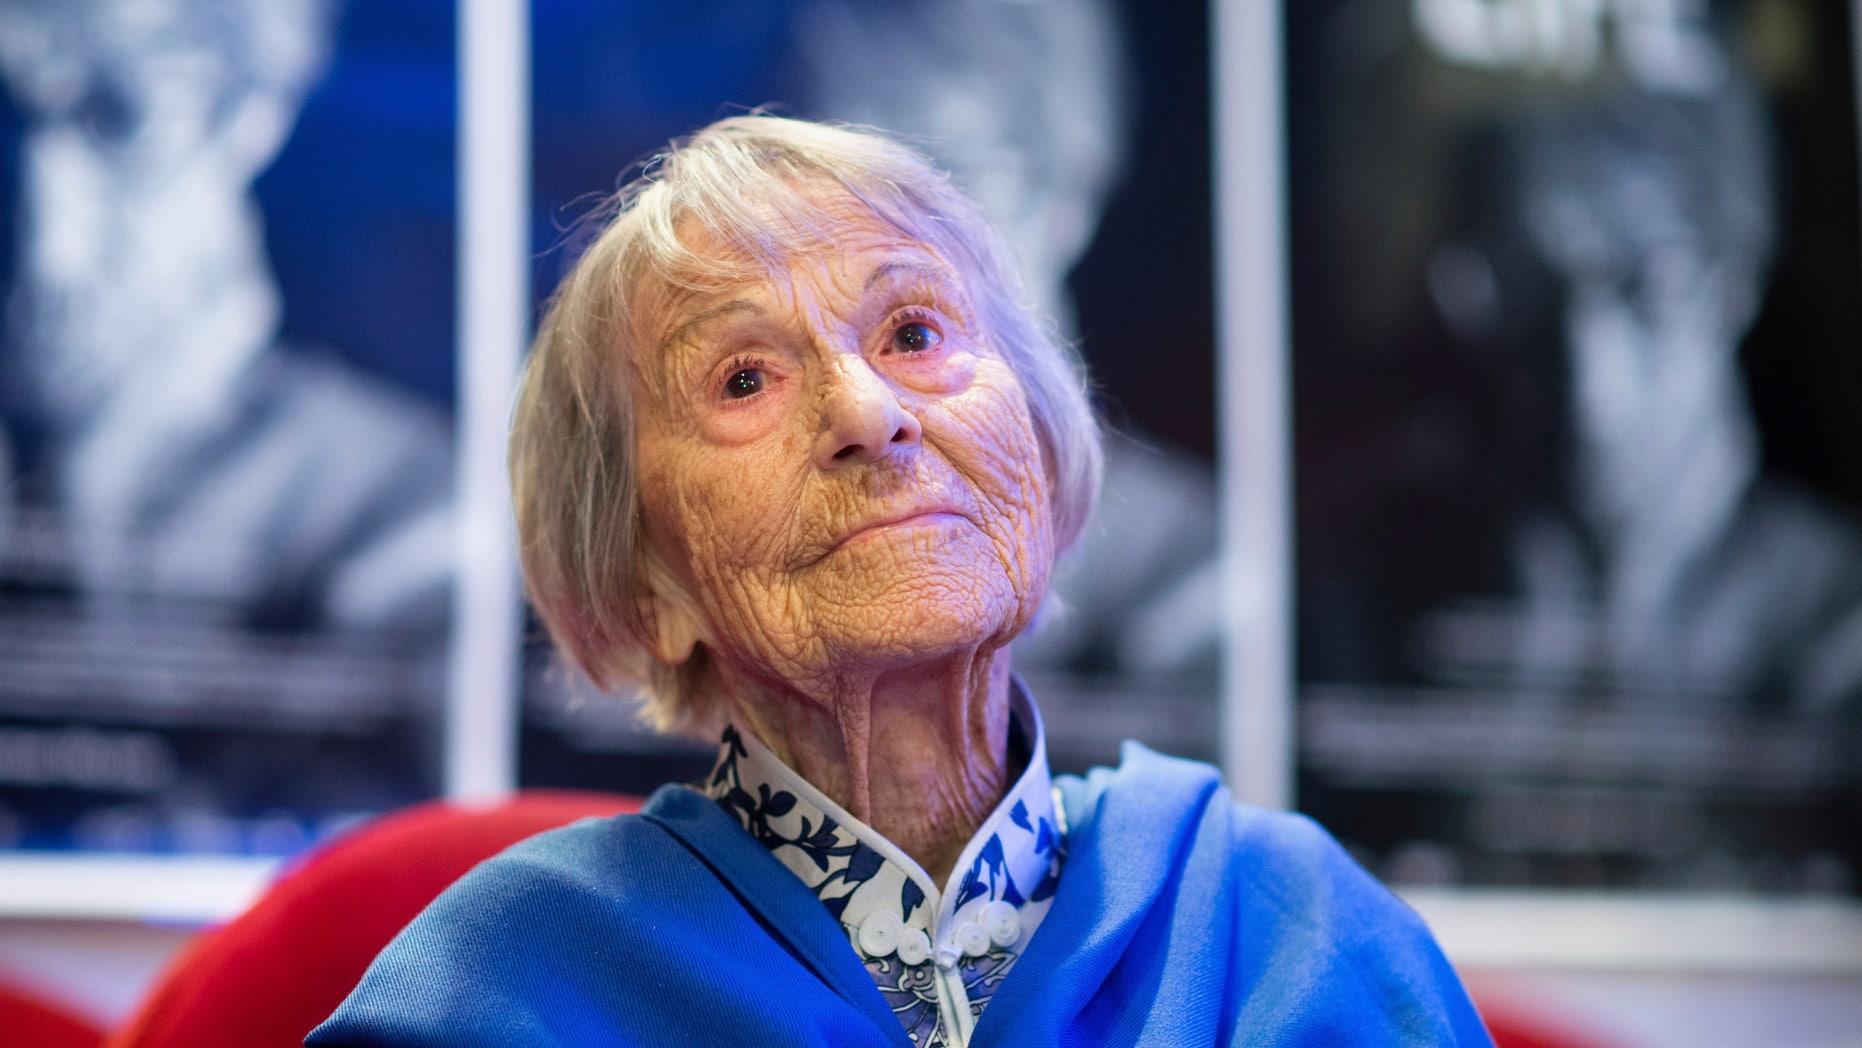 Brunhilde Pomsel, seen in 2016, was the former secretary of Nazi propaganda minister Joseph Goebbels.